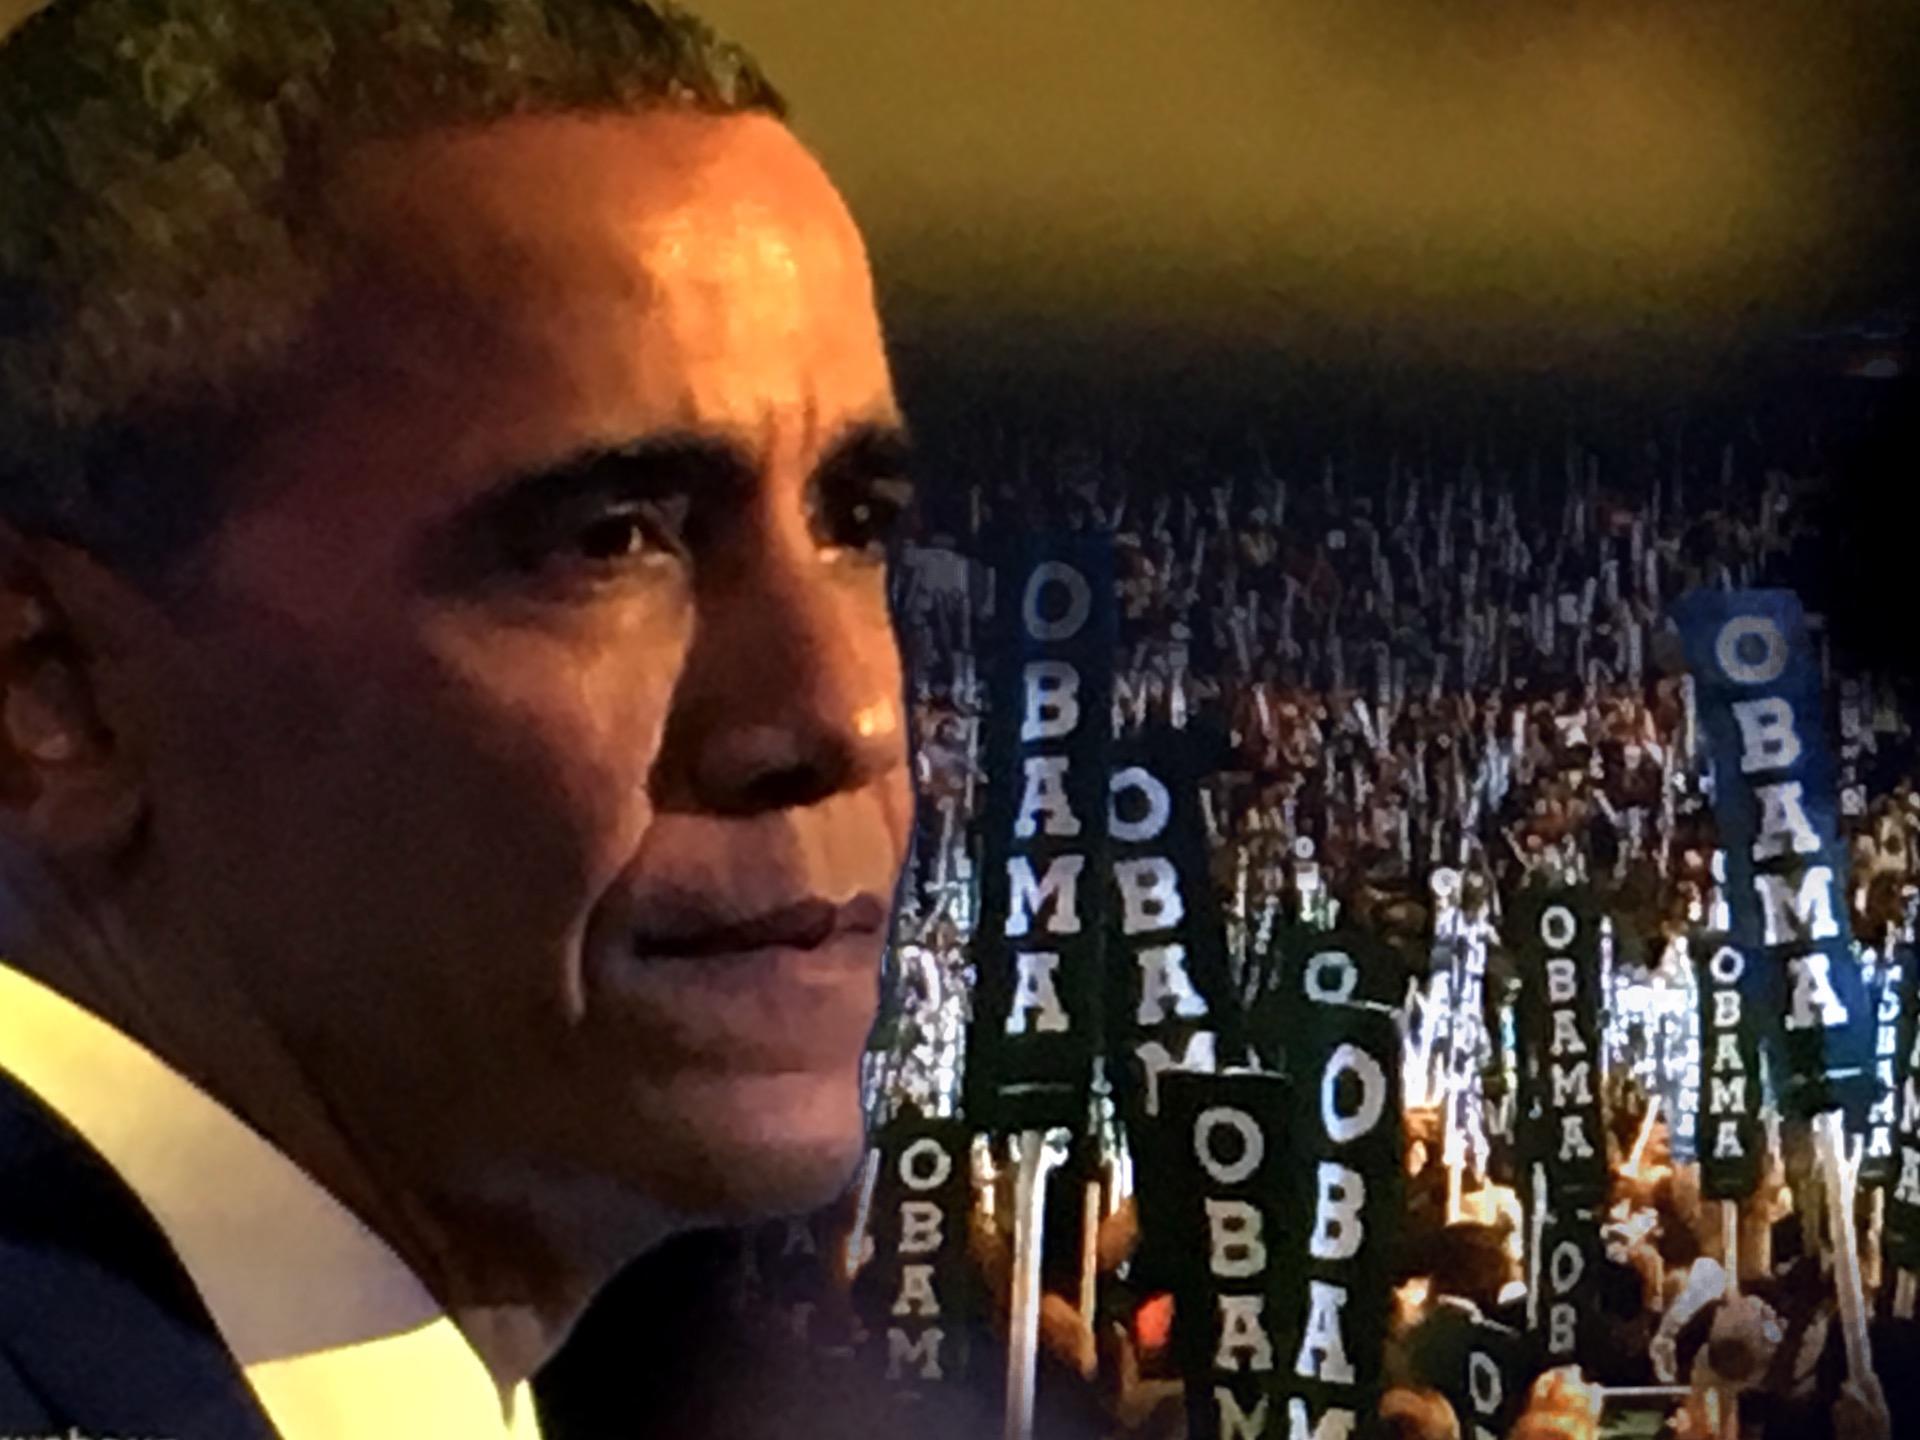 President Barack Obama addresses the DNC. (Composite image by Biz Herman/GroundTruth)